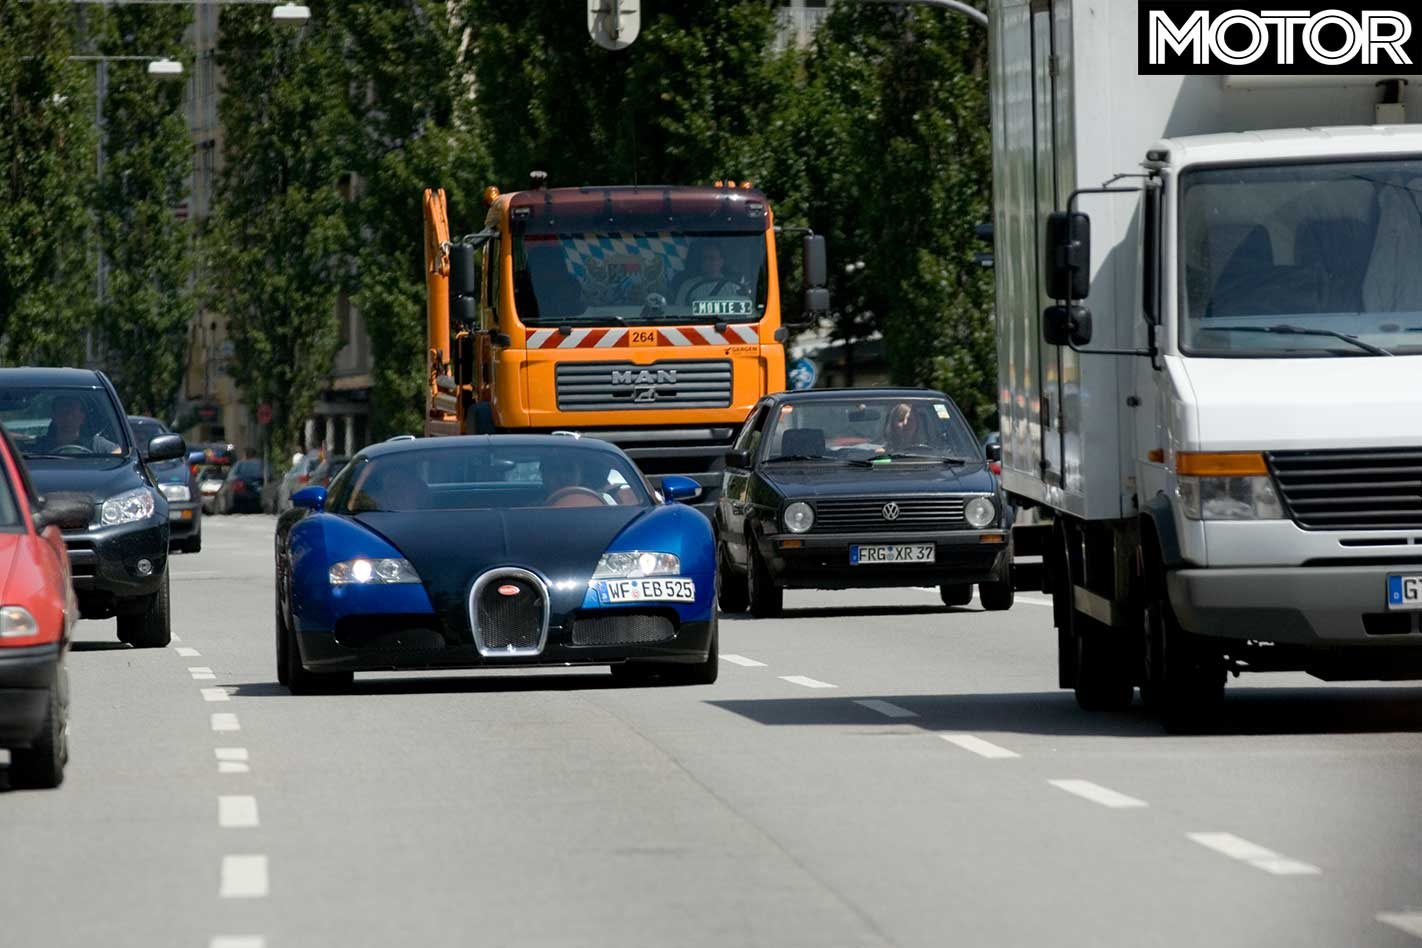 2007 bugatti veyron review: classic motor